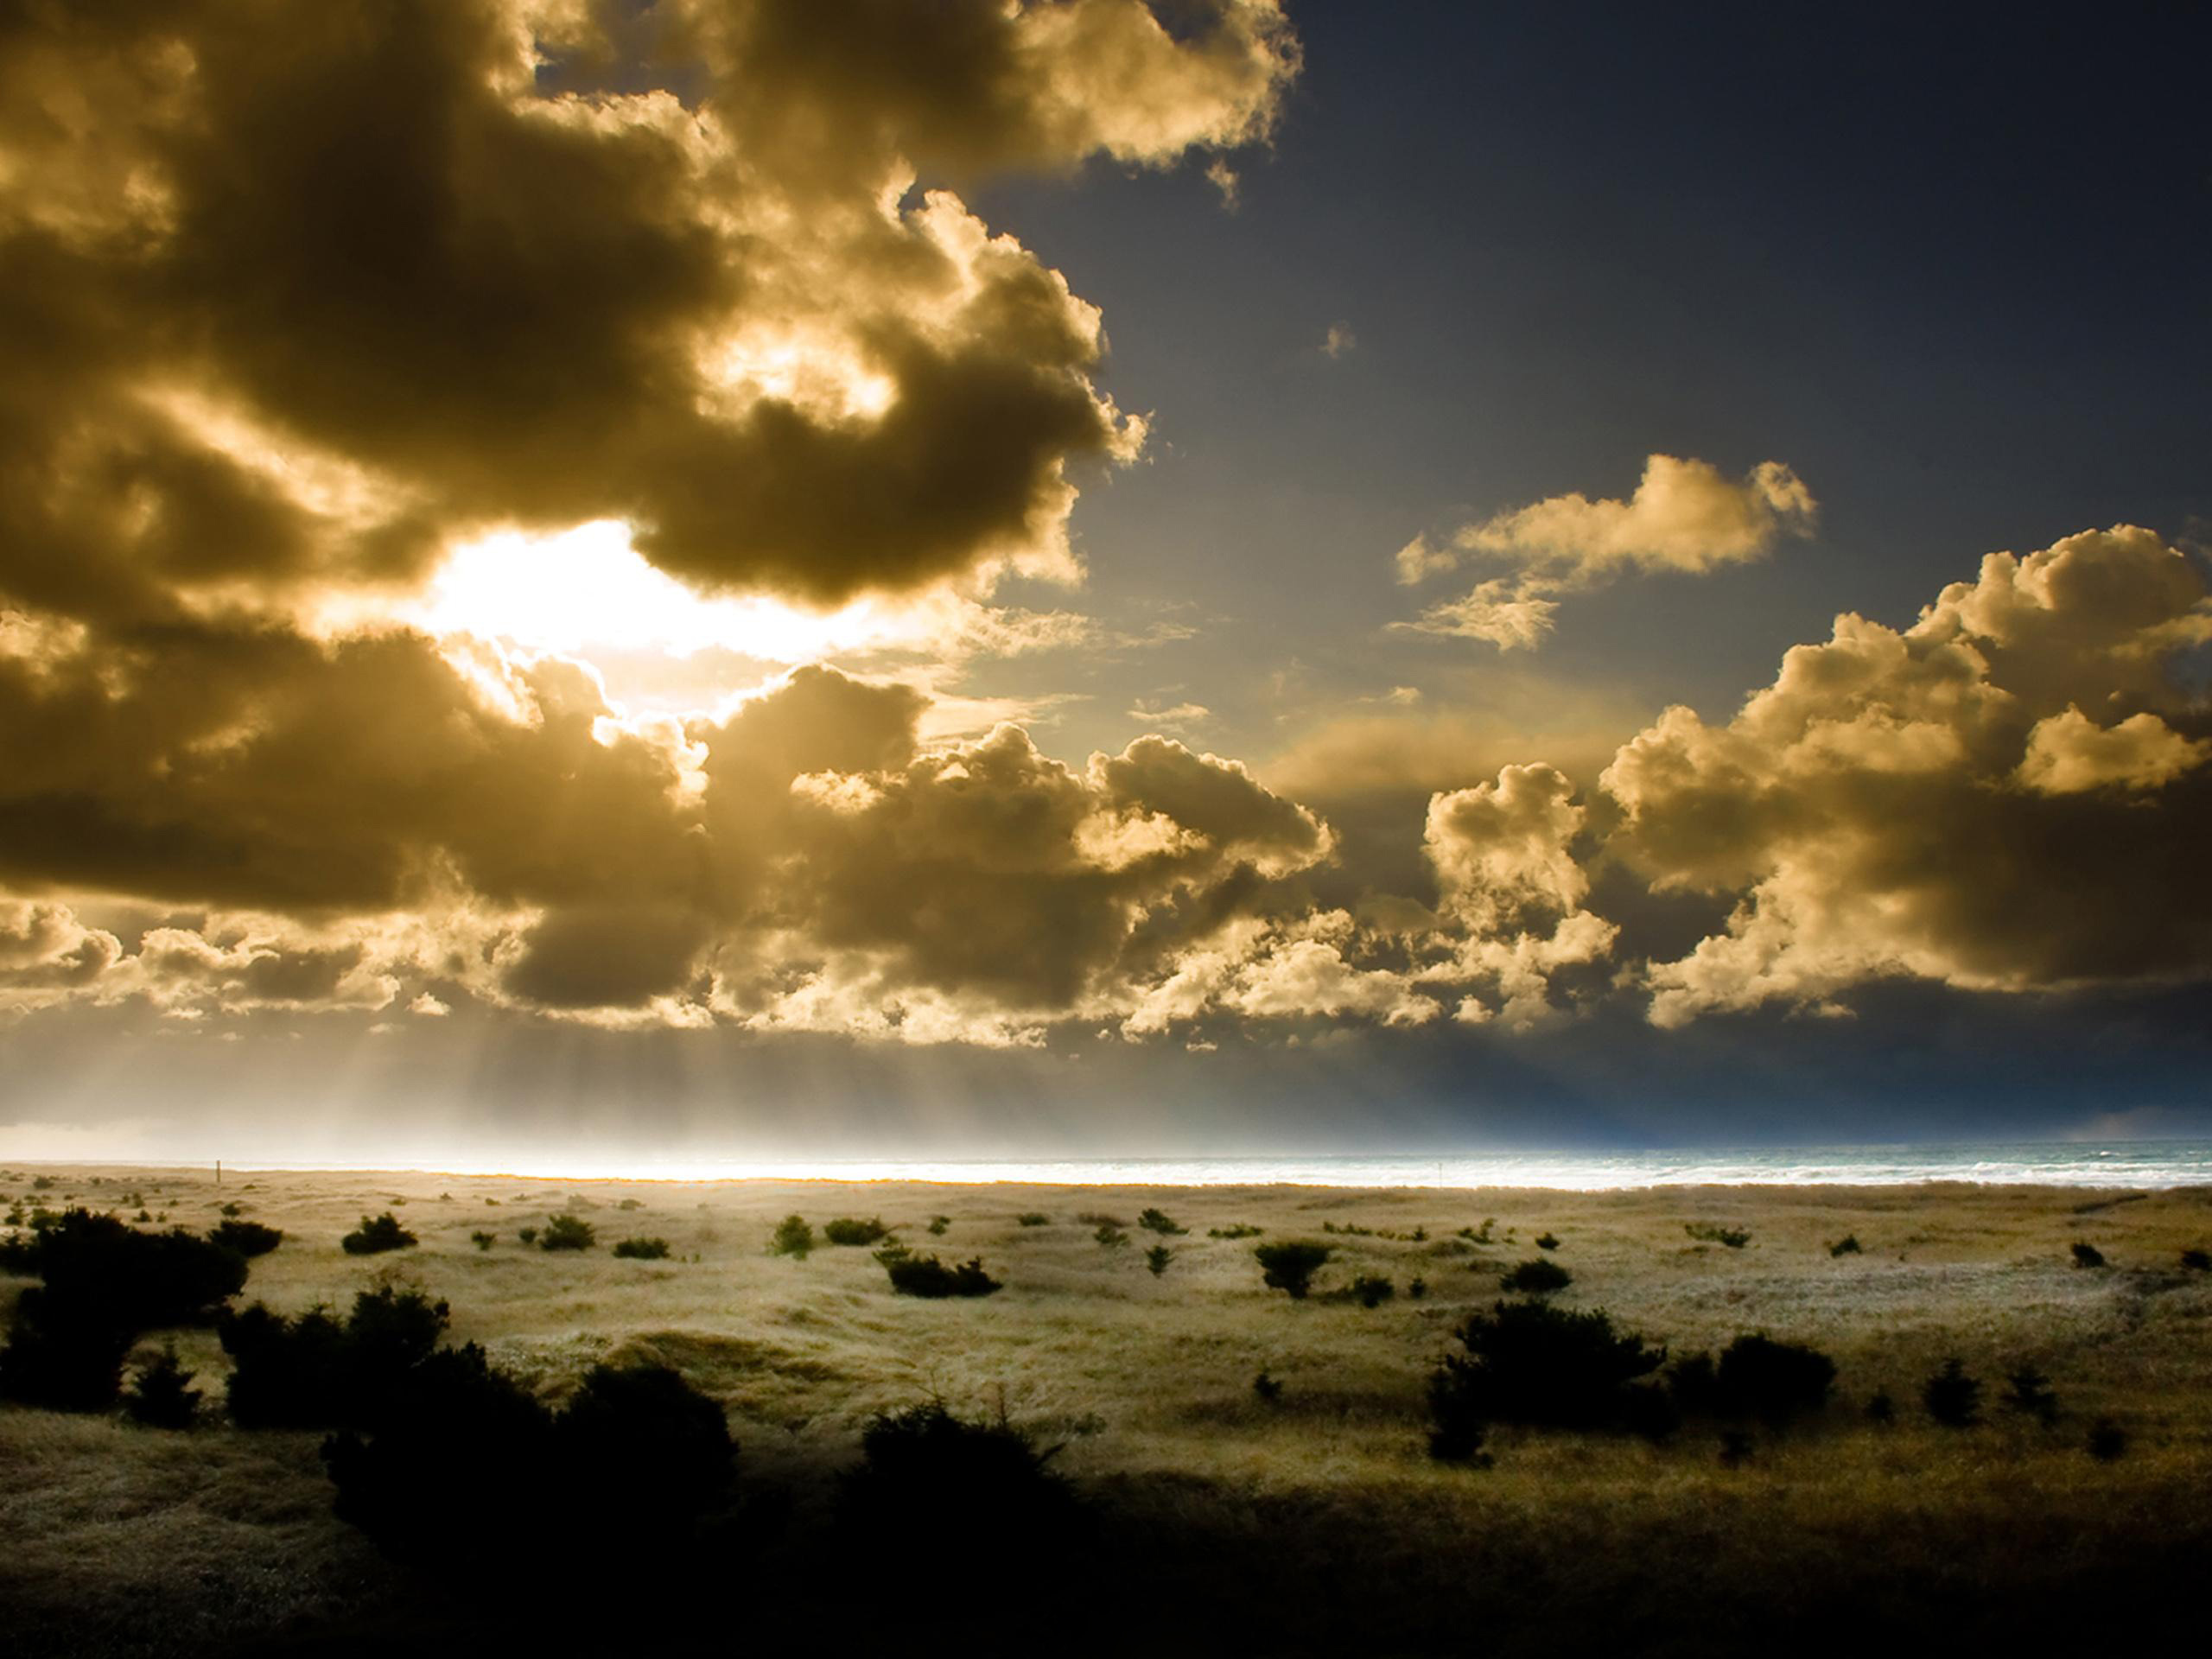 природа горизонт небо облака деревья солнце nature horizon the sky clouds trees sun без смс